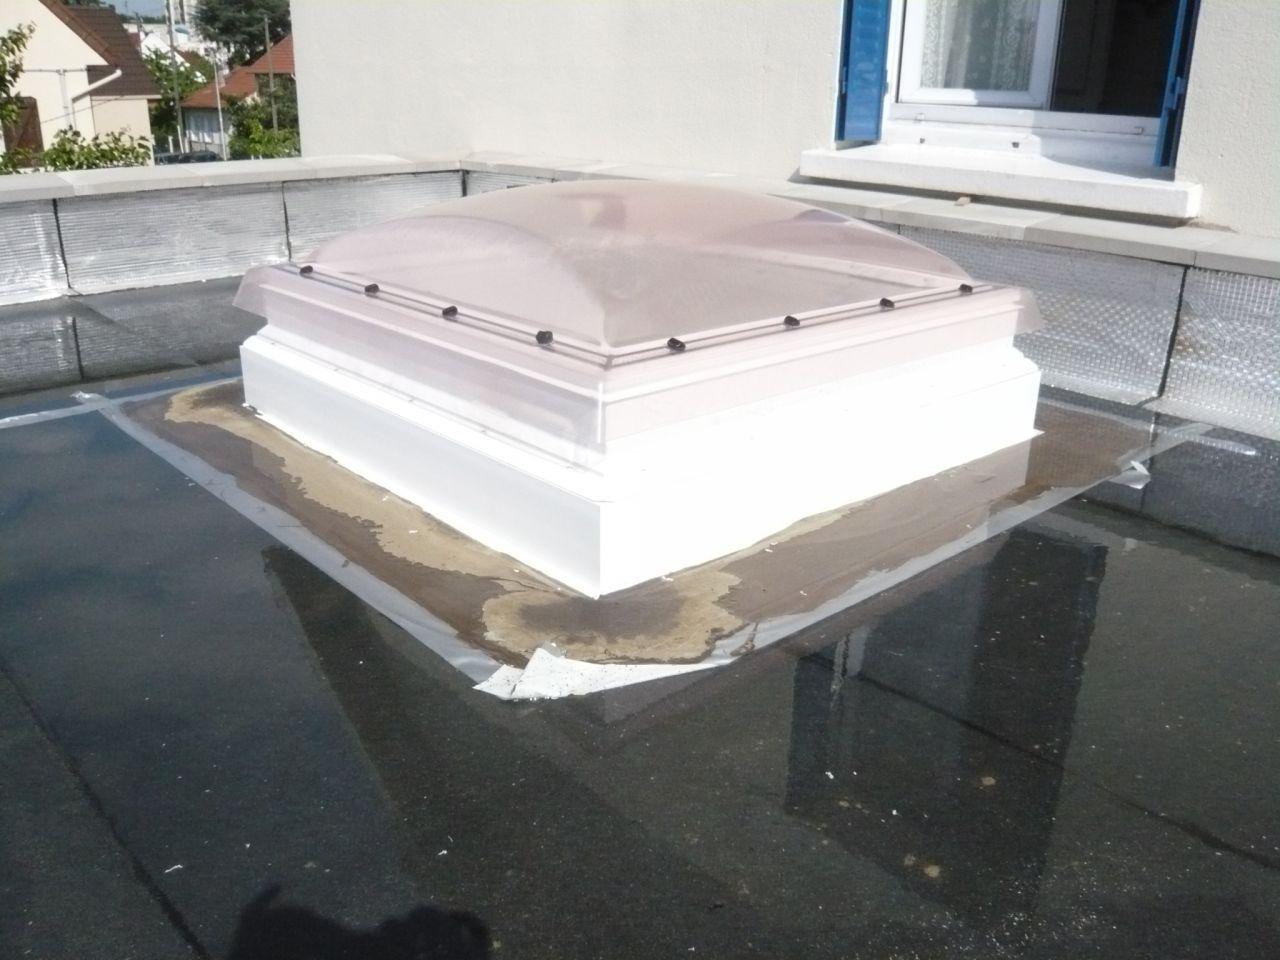 quelques questions concernant un toit terrasse 7 messages. Black Bedroom Furniture Sets. Home Design Ideas